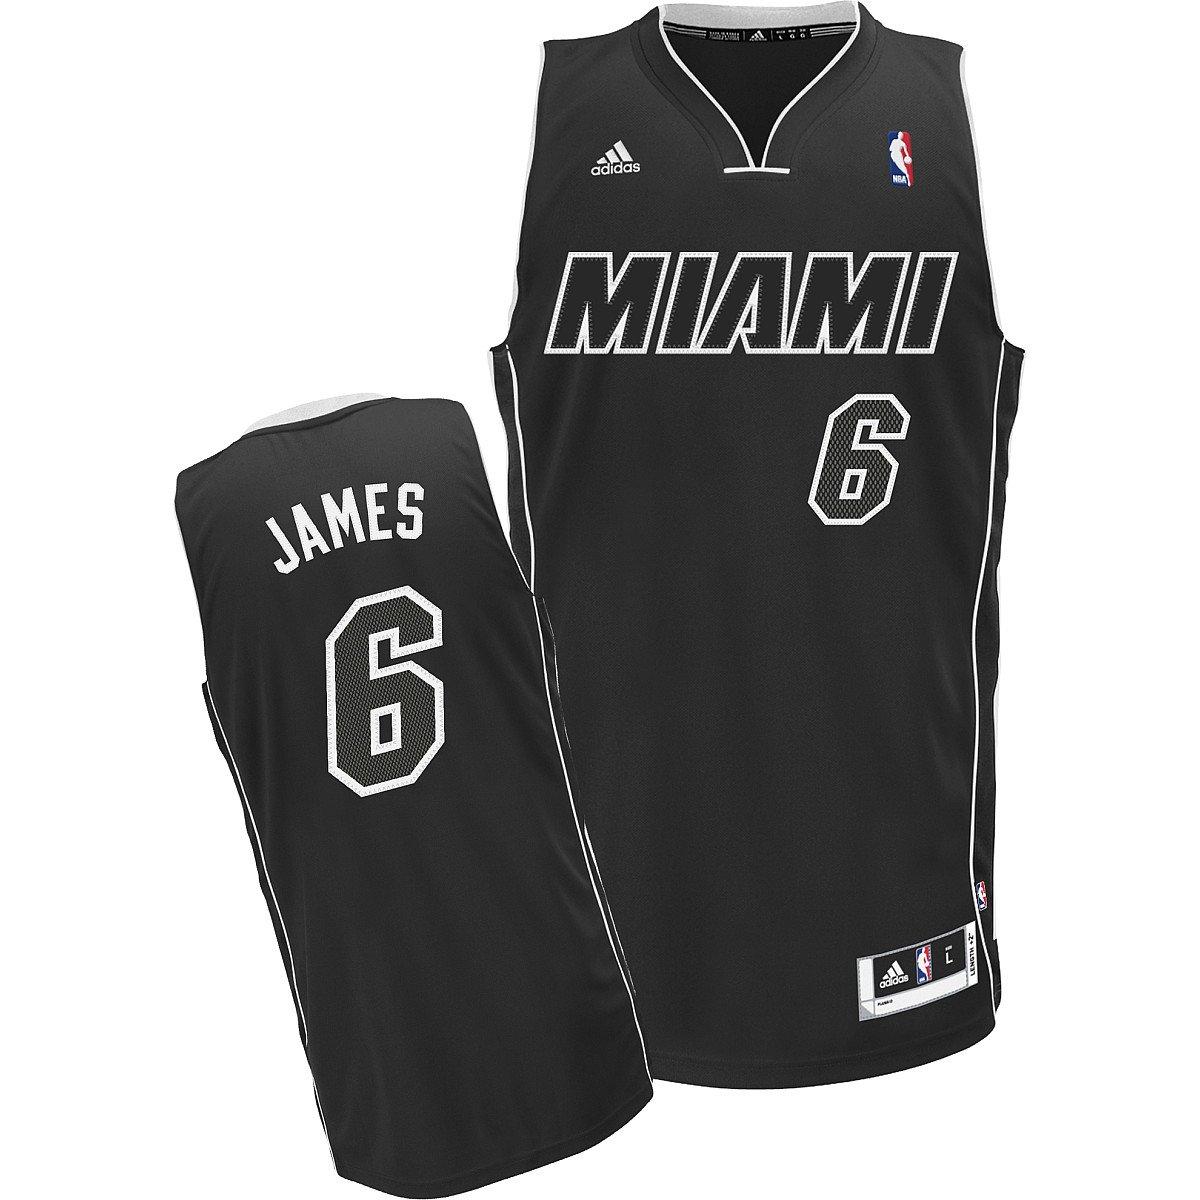 Buy Nba Men S Miami Heat Lebron James Black Black White Swingman Jersey Black White Medium Online At Low Prices In India Amazon In